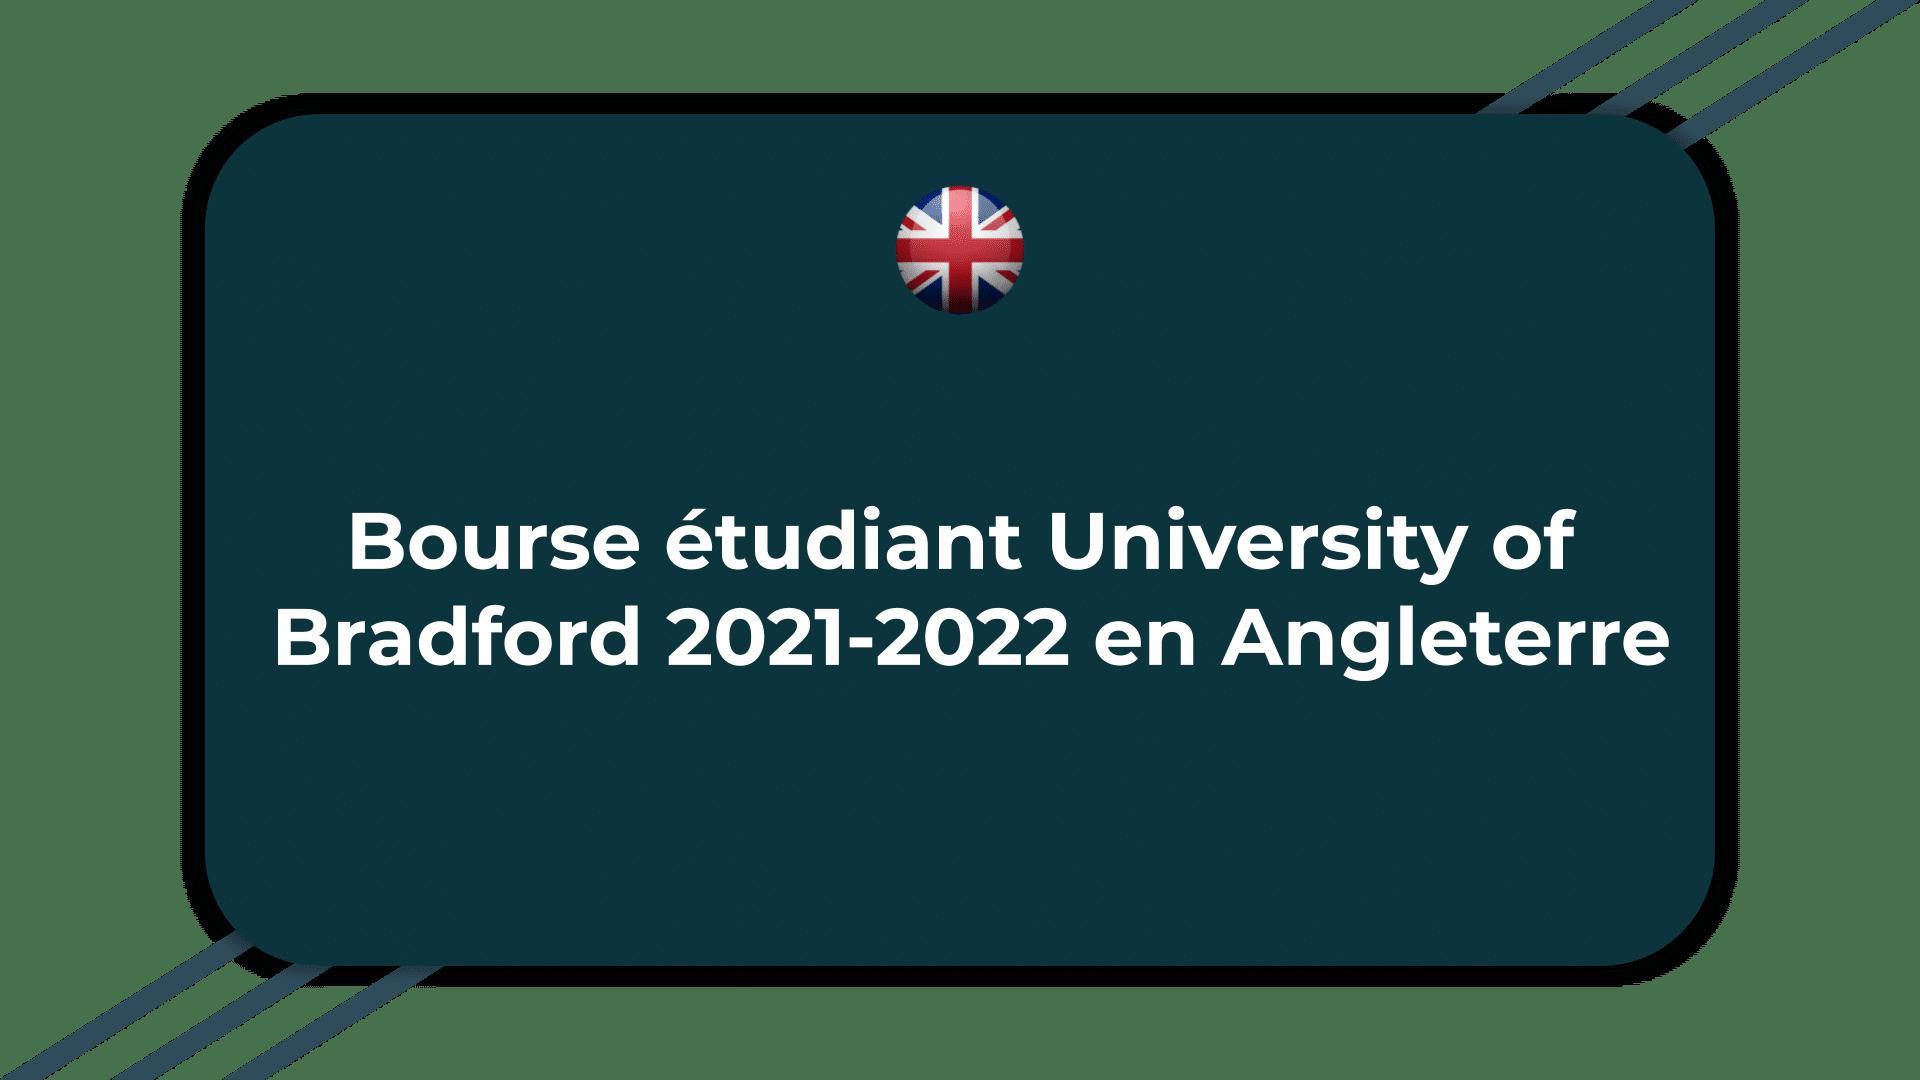 Bourse étudiant University of Bradford